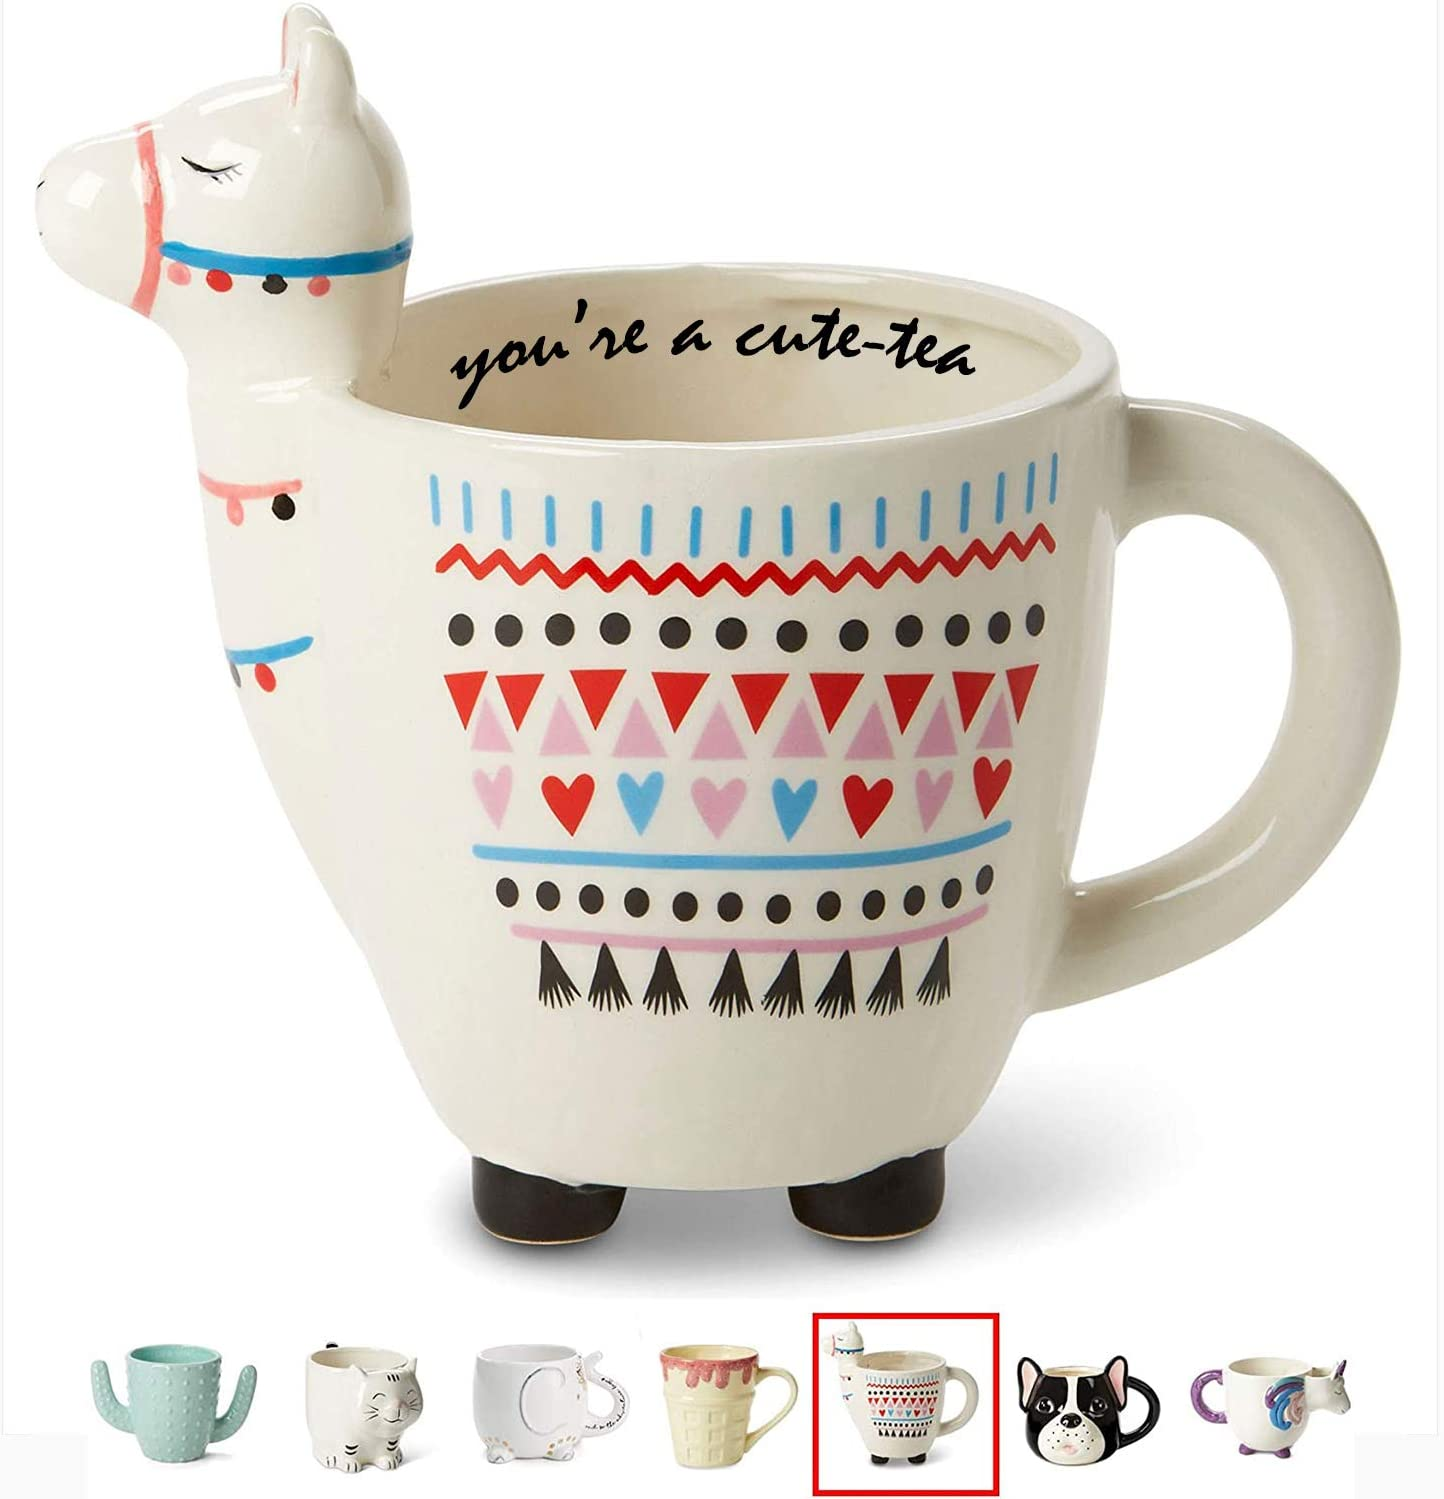 "White Ceramic Coffee or Tea Mugs: Tri-Coastal Design""You're A Cute-Tea"" Llama Coffee Mug with Hand Printed Designs and Printed Saying - 18.6 Fluid Ounce Large, Cute Handmade Cup"